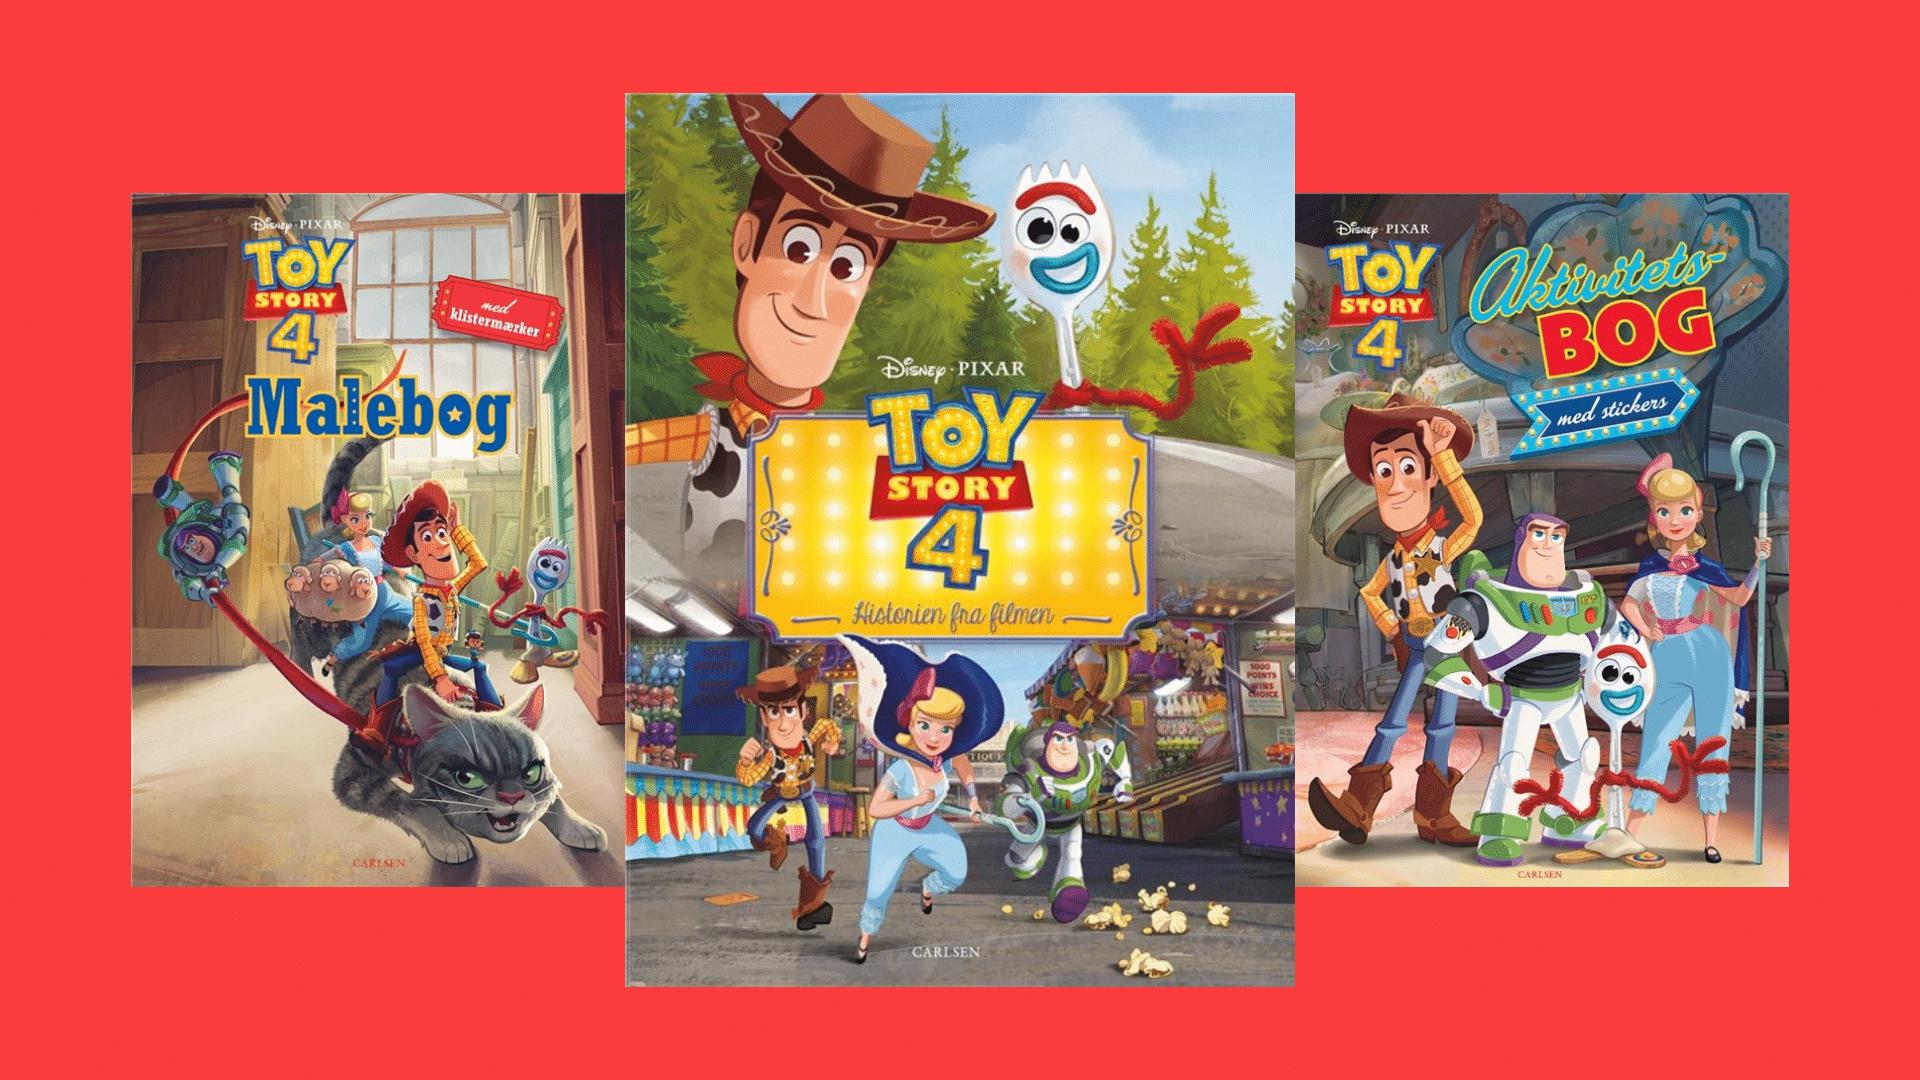 Toy Story, Toy Story 4, Woody, Disney, malebøger, filmbøger, filmbog